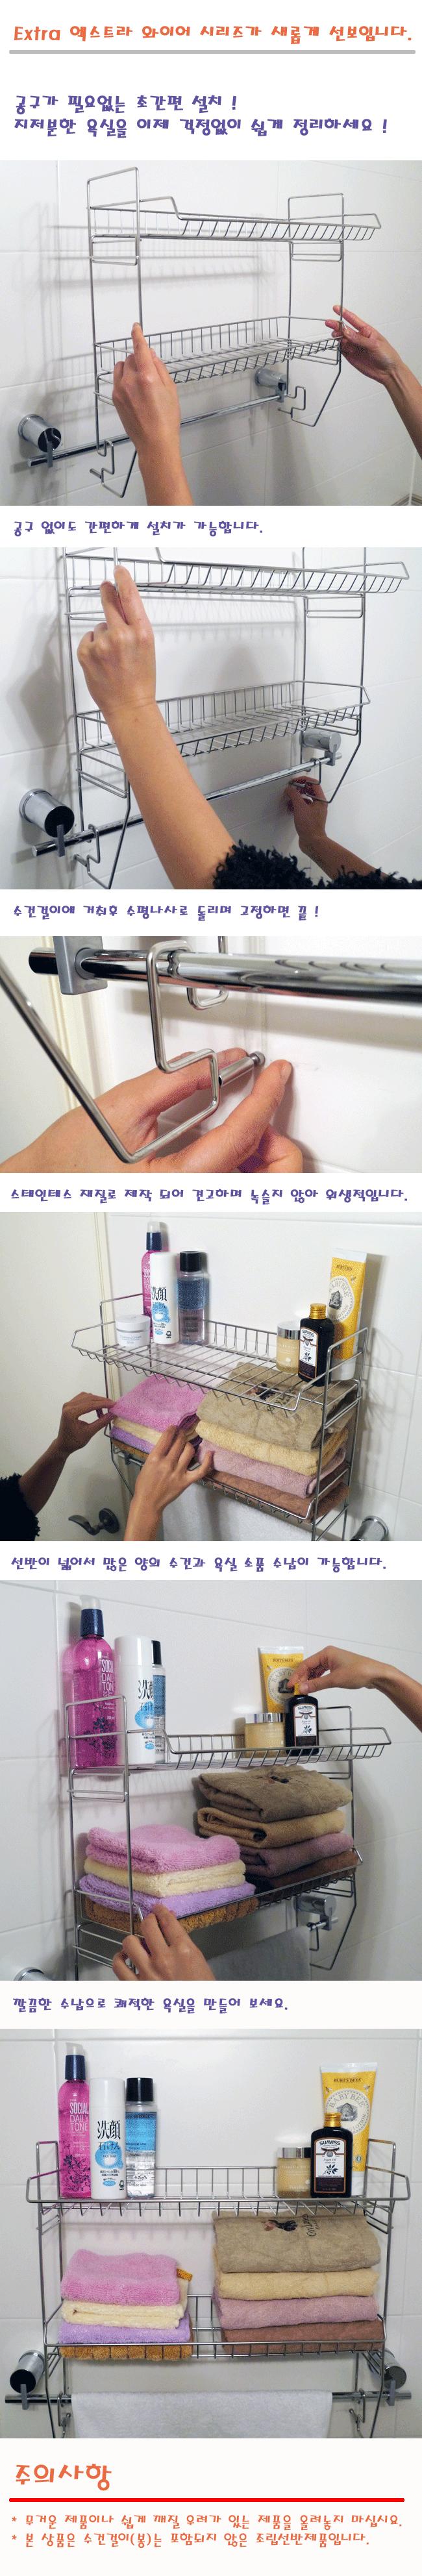 [ seachang ] Roupas de cama prateleira 2 apenas